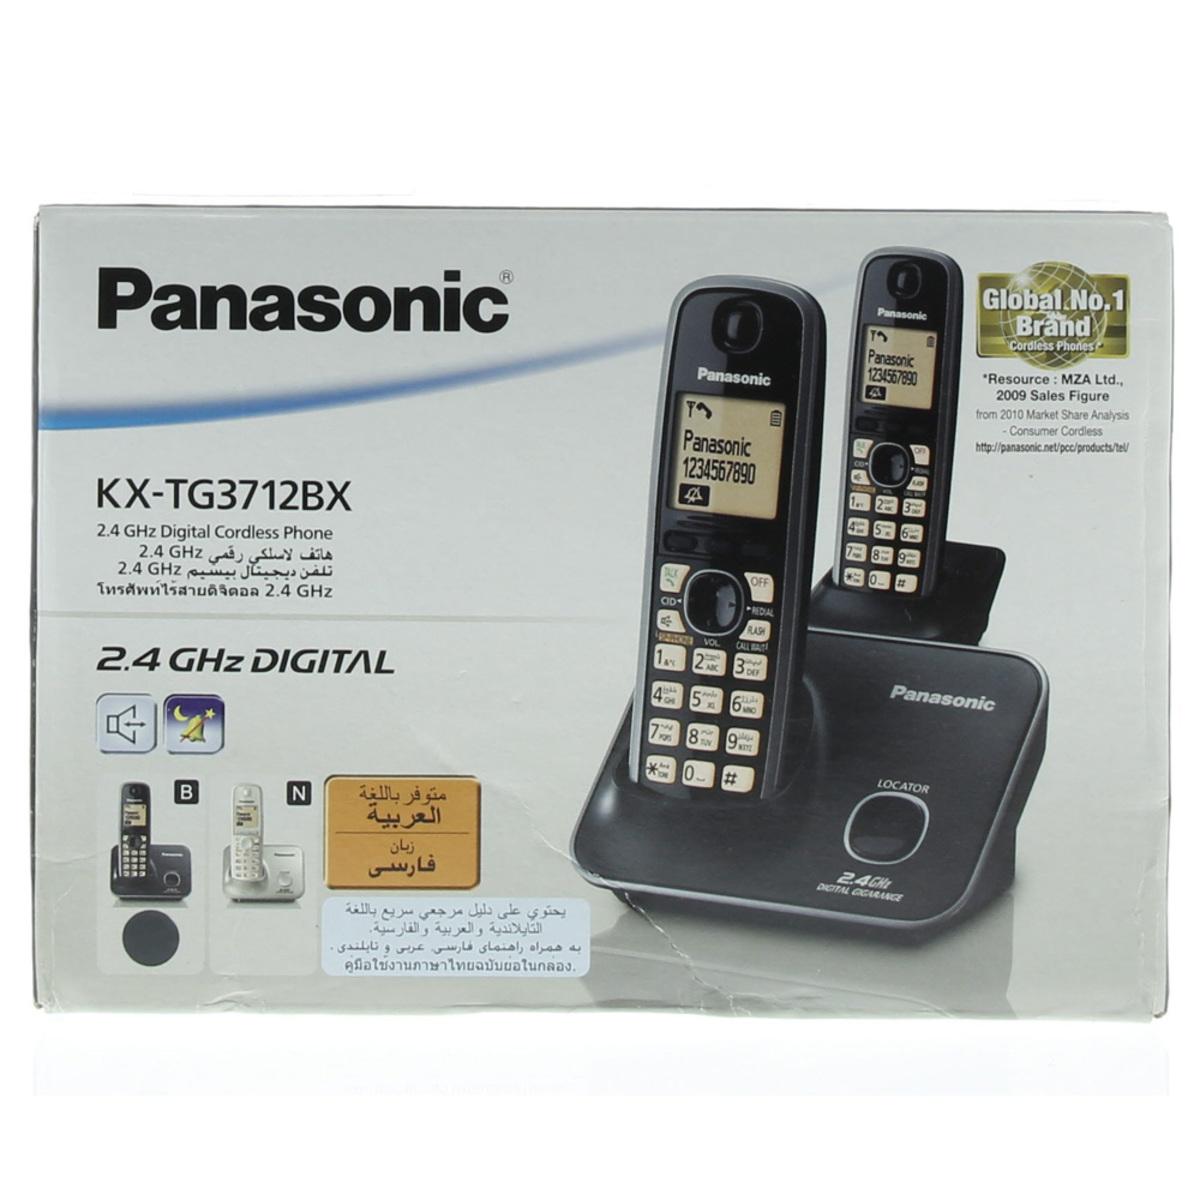 Buy Panasonic Cordless Phone KXTG3712 - Cordless Telephone